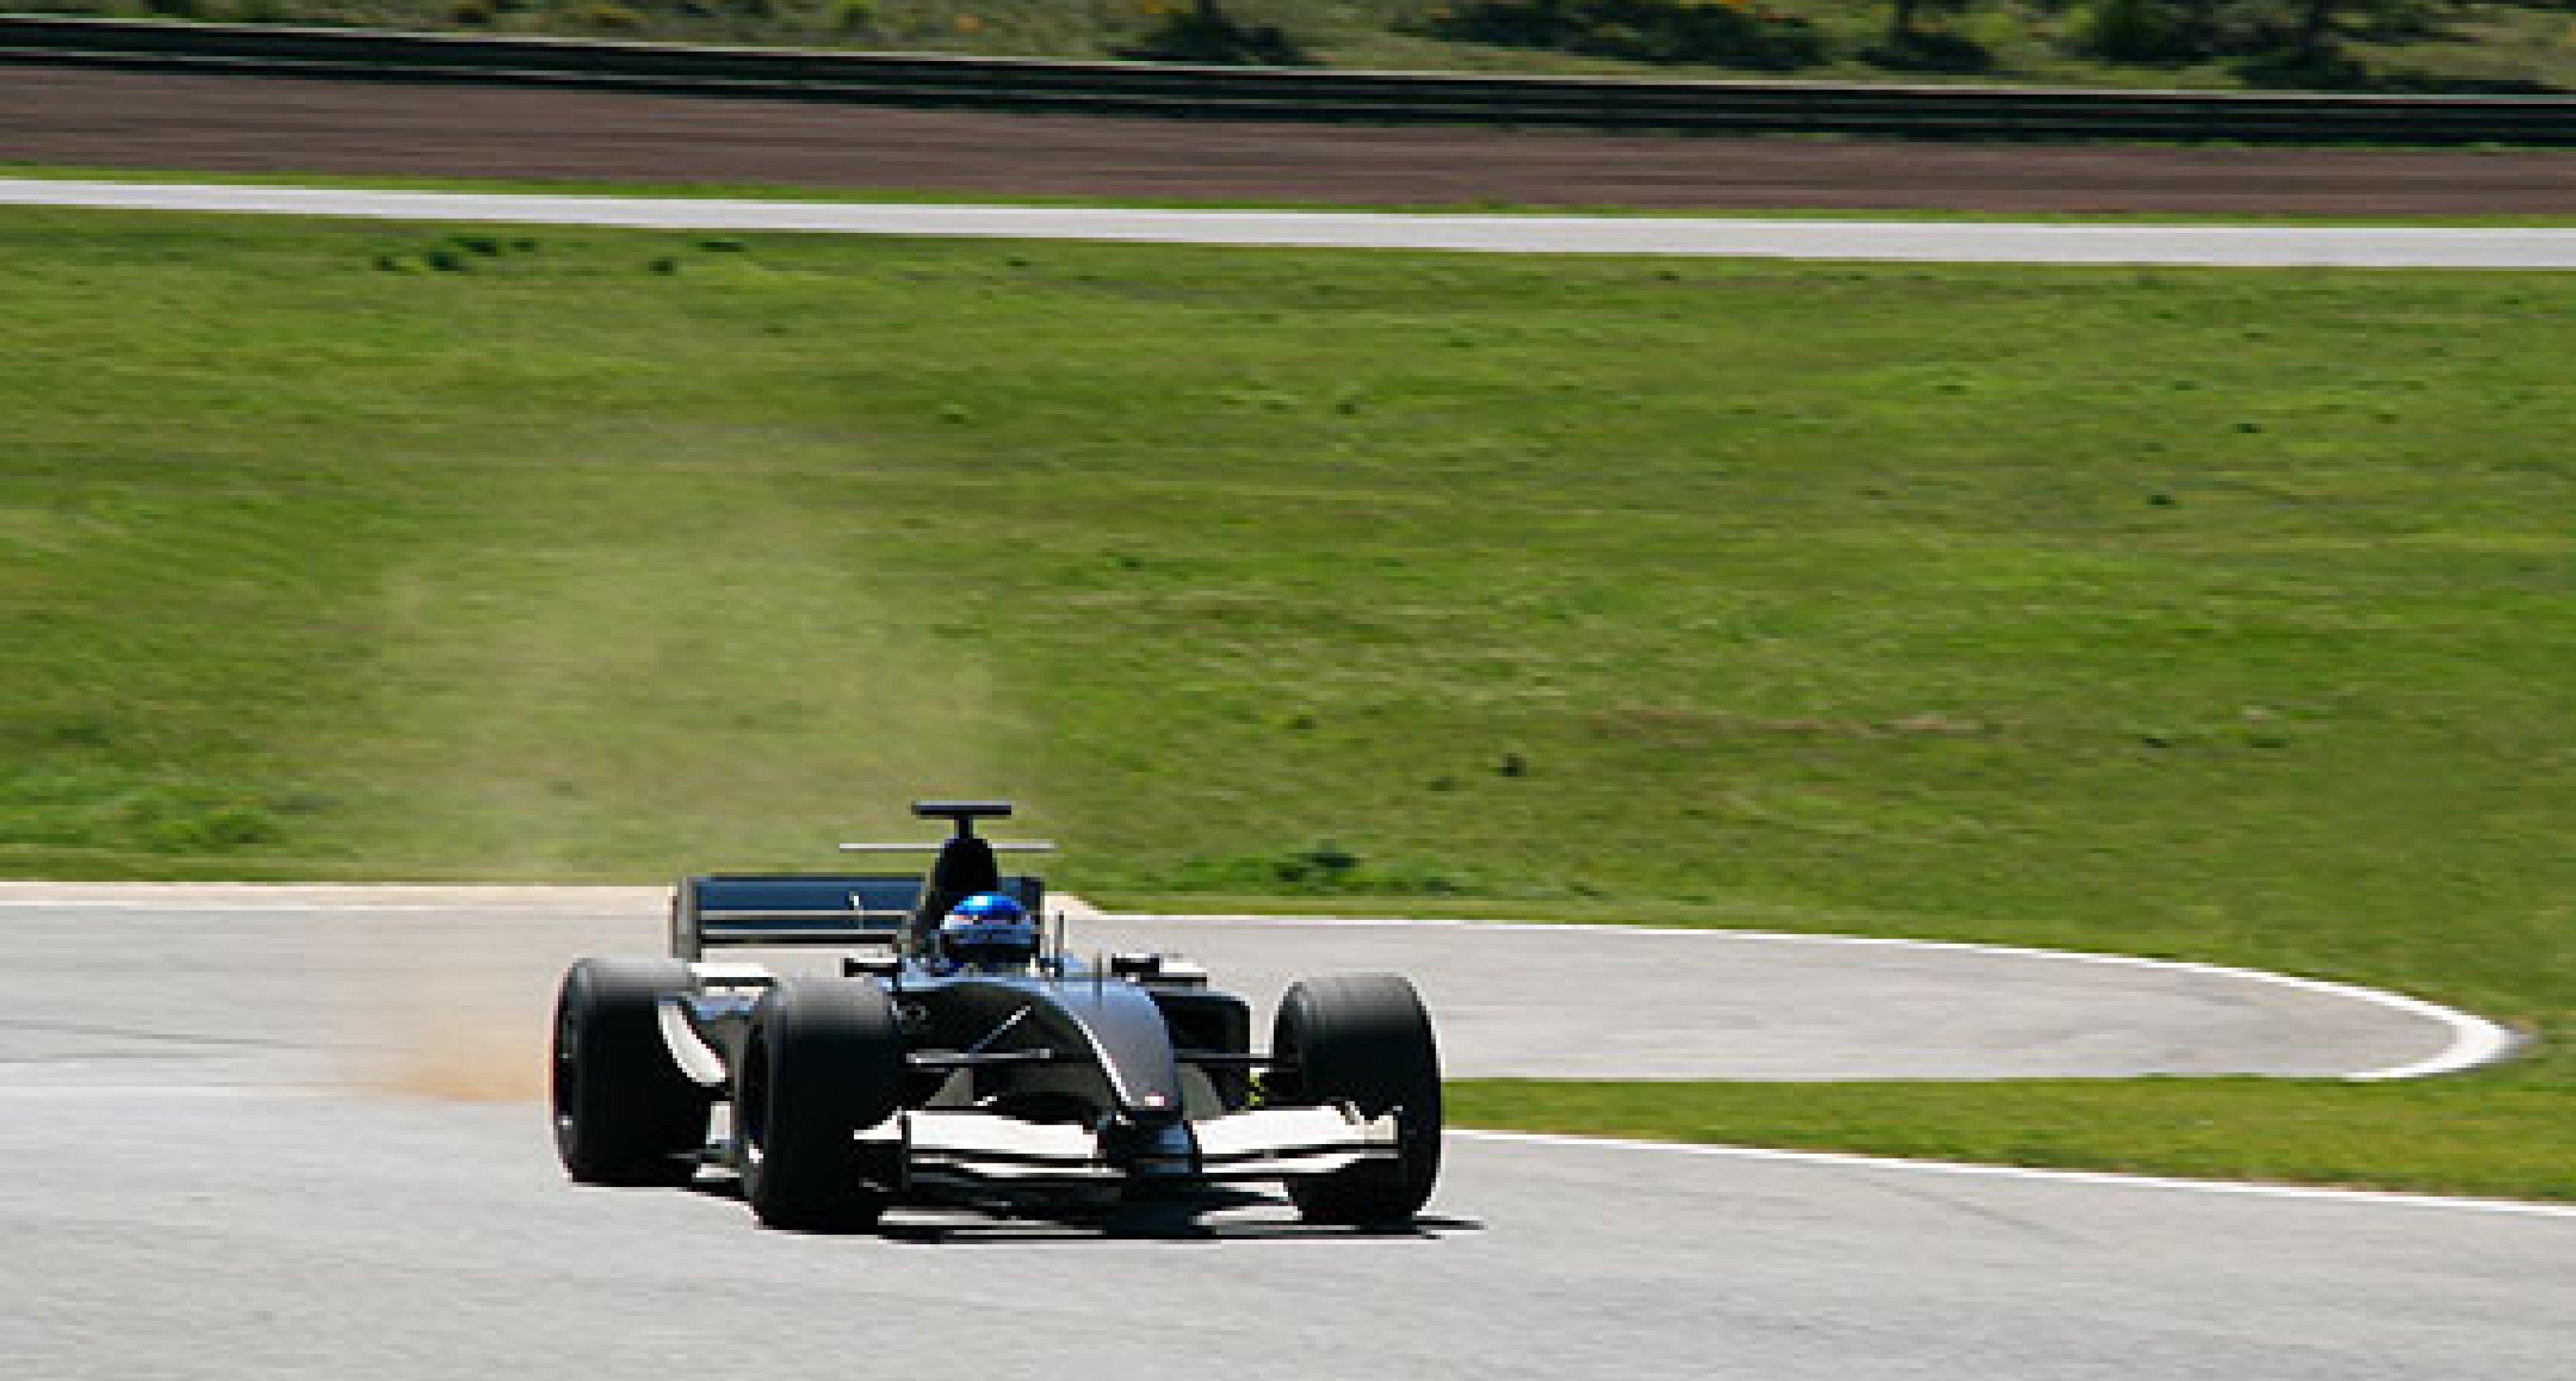 FV10 Teams Up with Ascari Race Resort